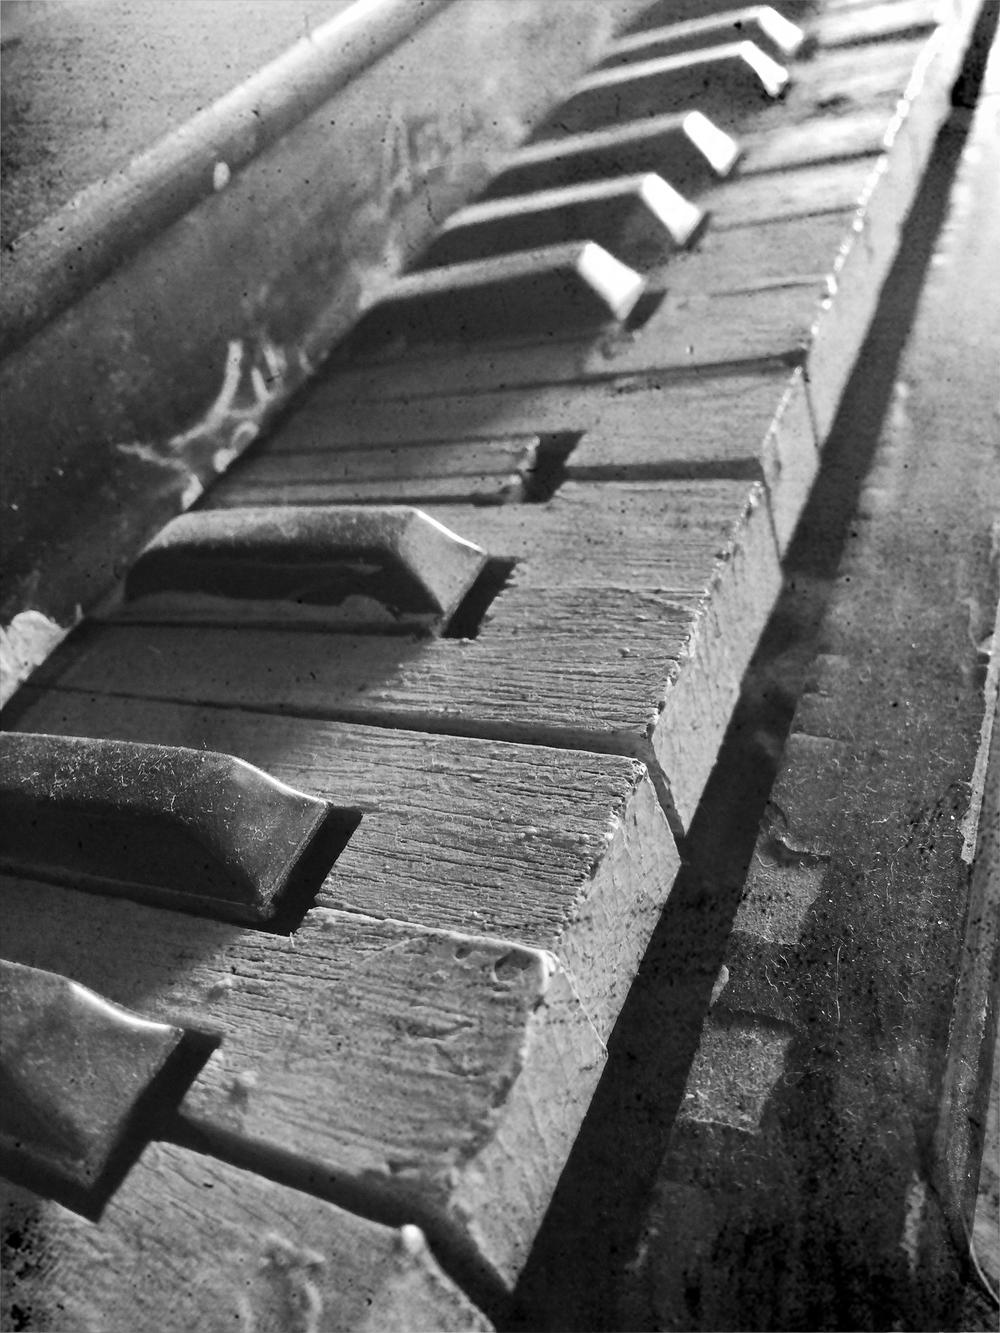 toy pianoIMG_7027.bw.jpg